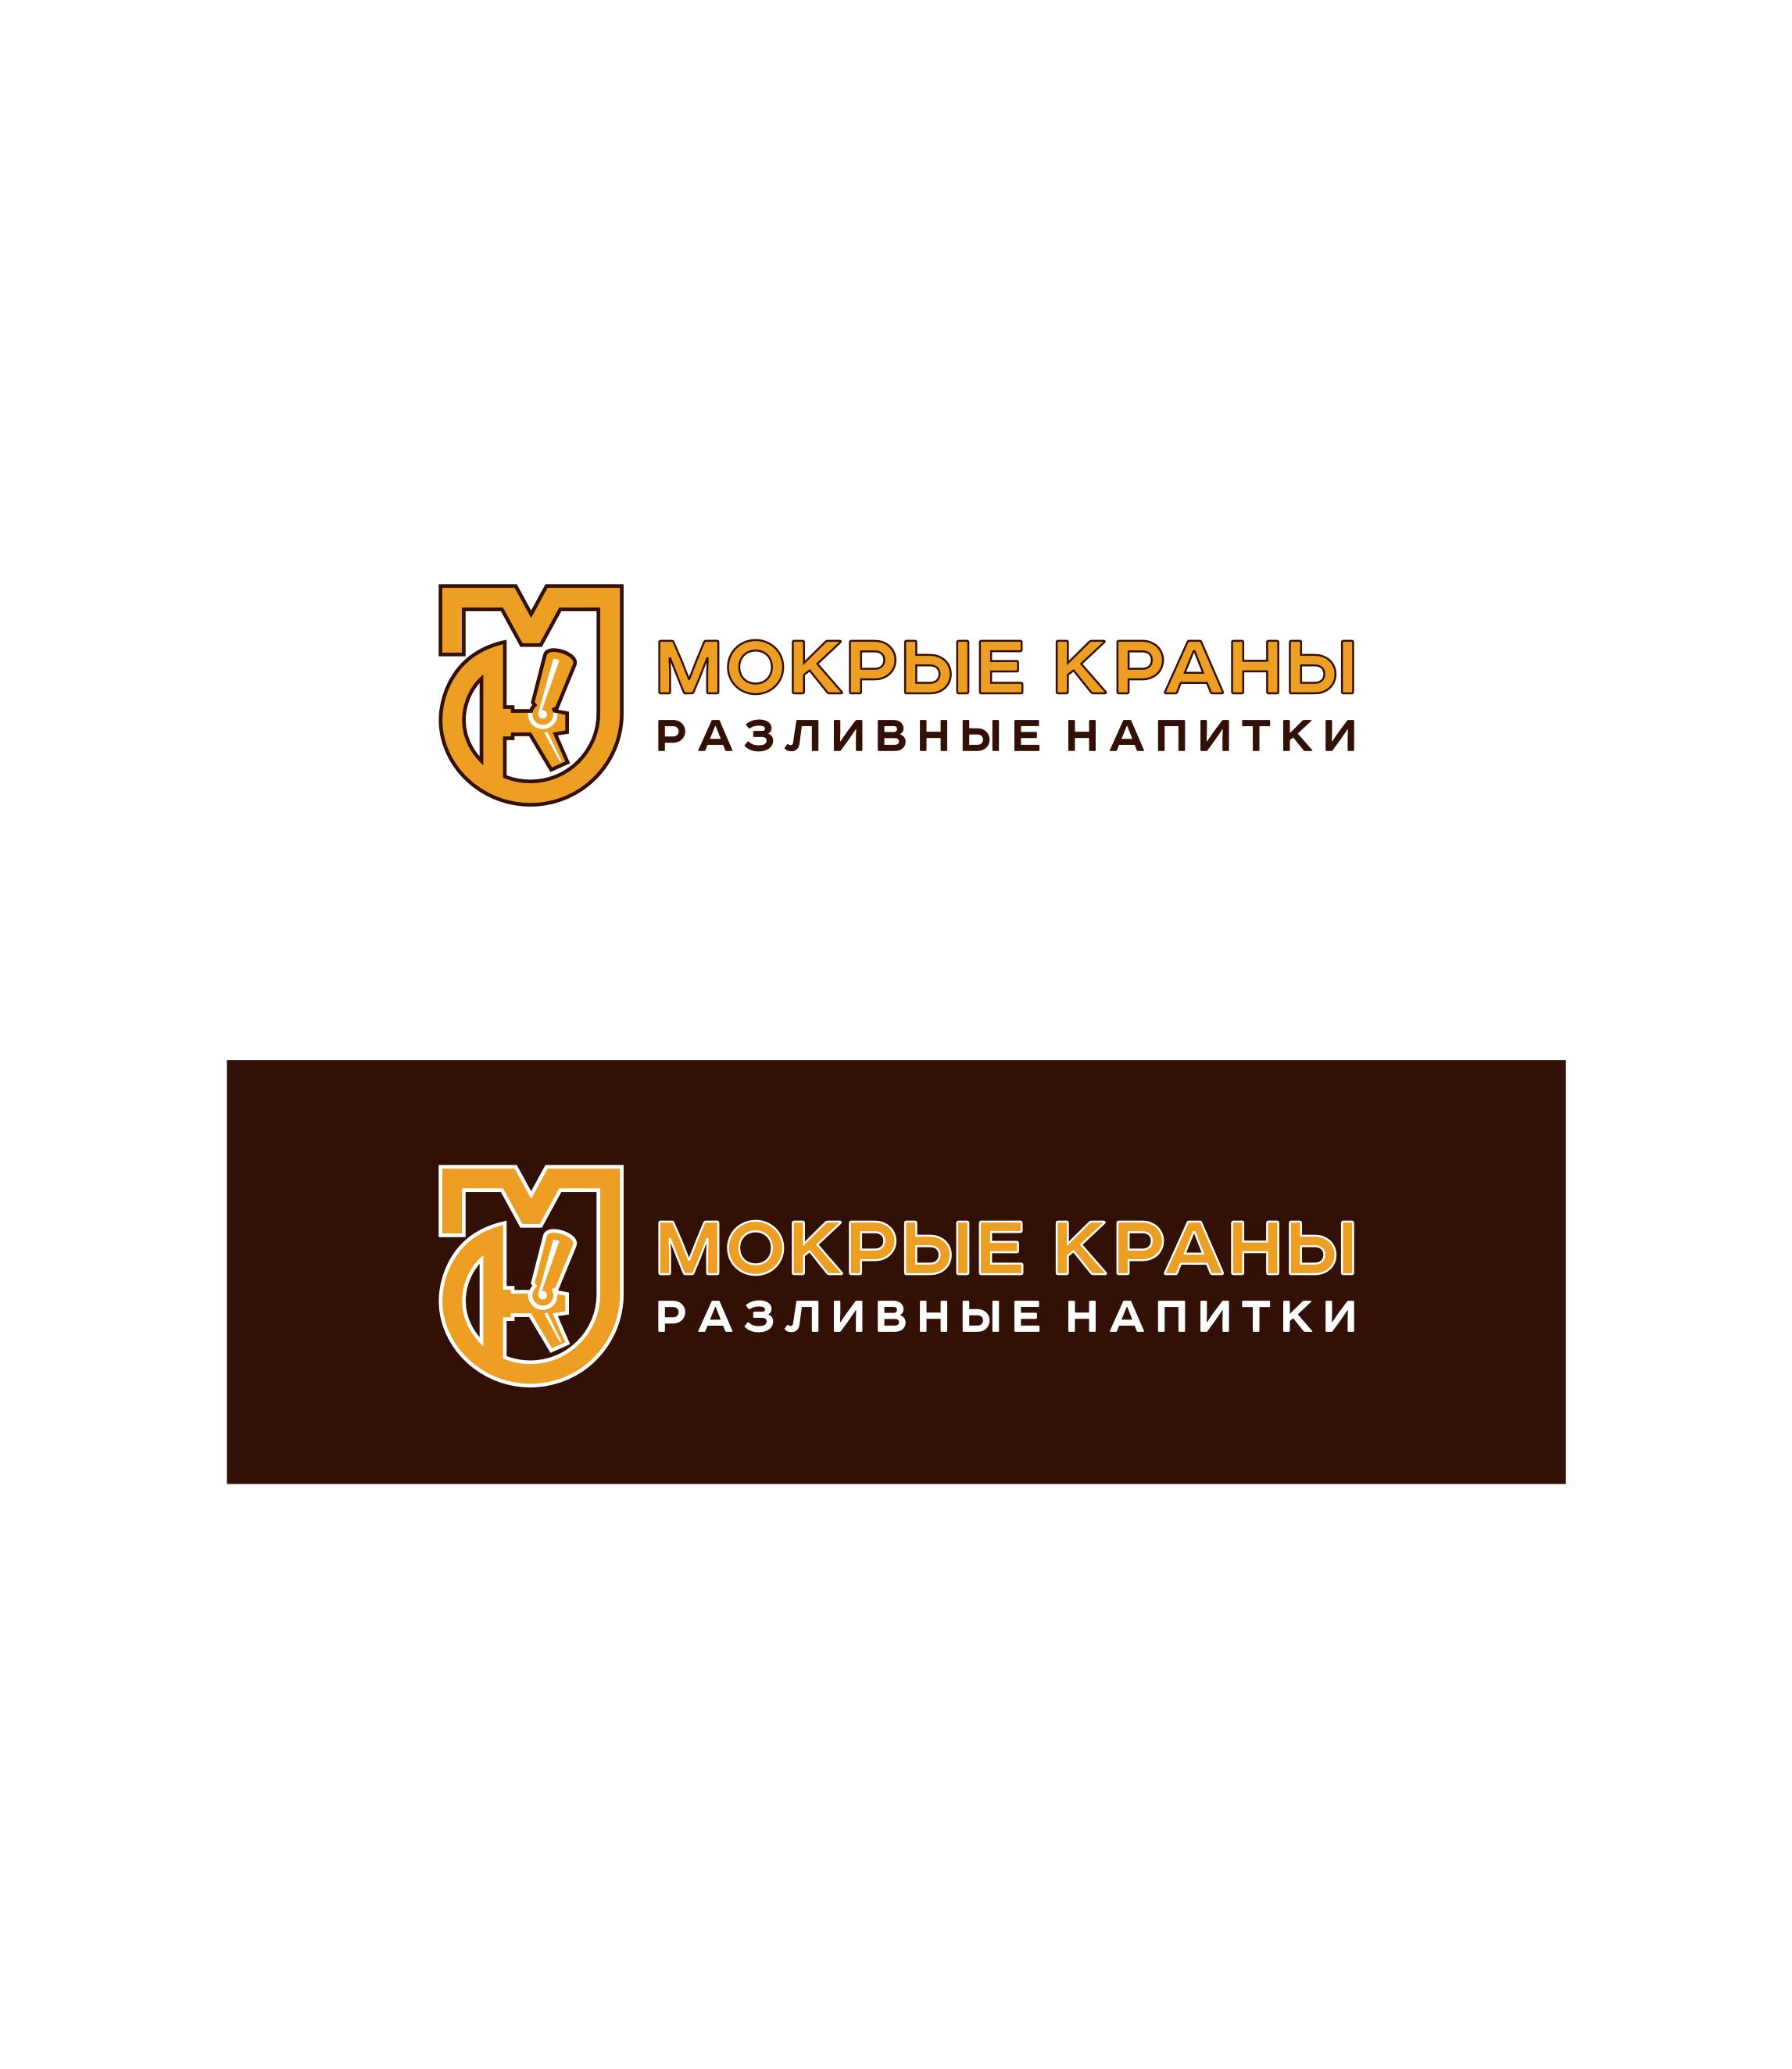 Вывеска/логотип для пивного магазина фото f_2626022935ae0b5c.png